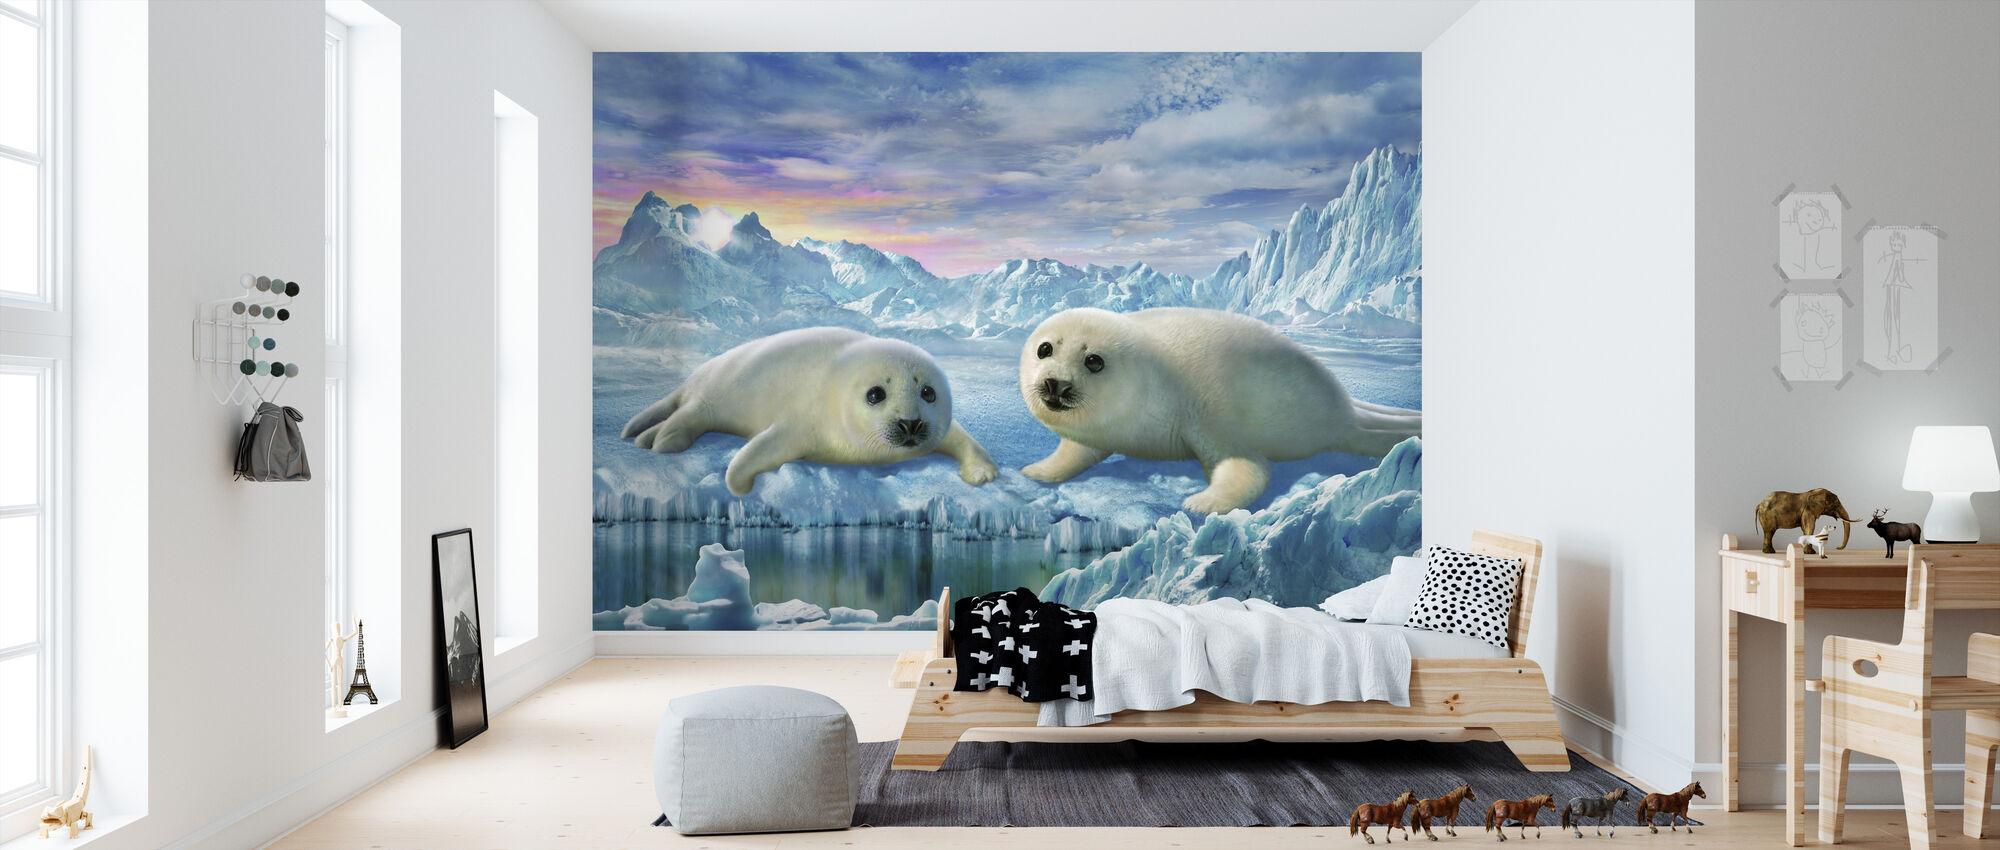 Seal Pups - Wallpaper - Kids Room